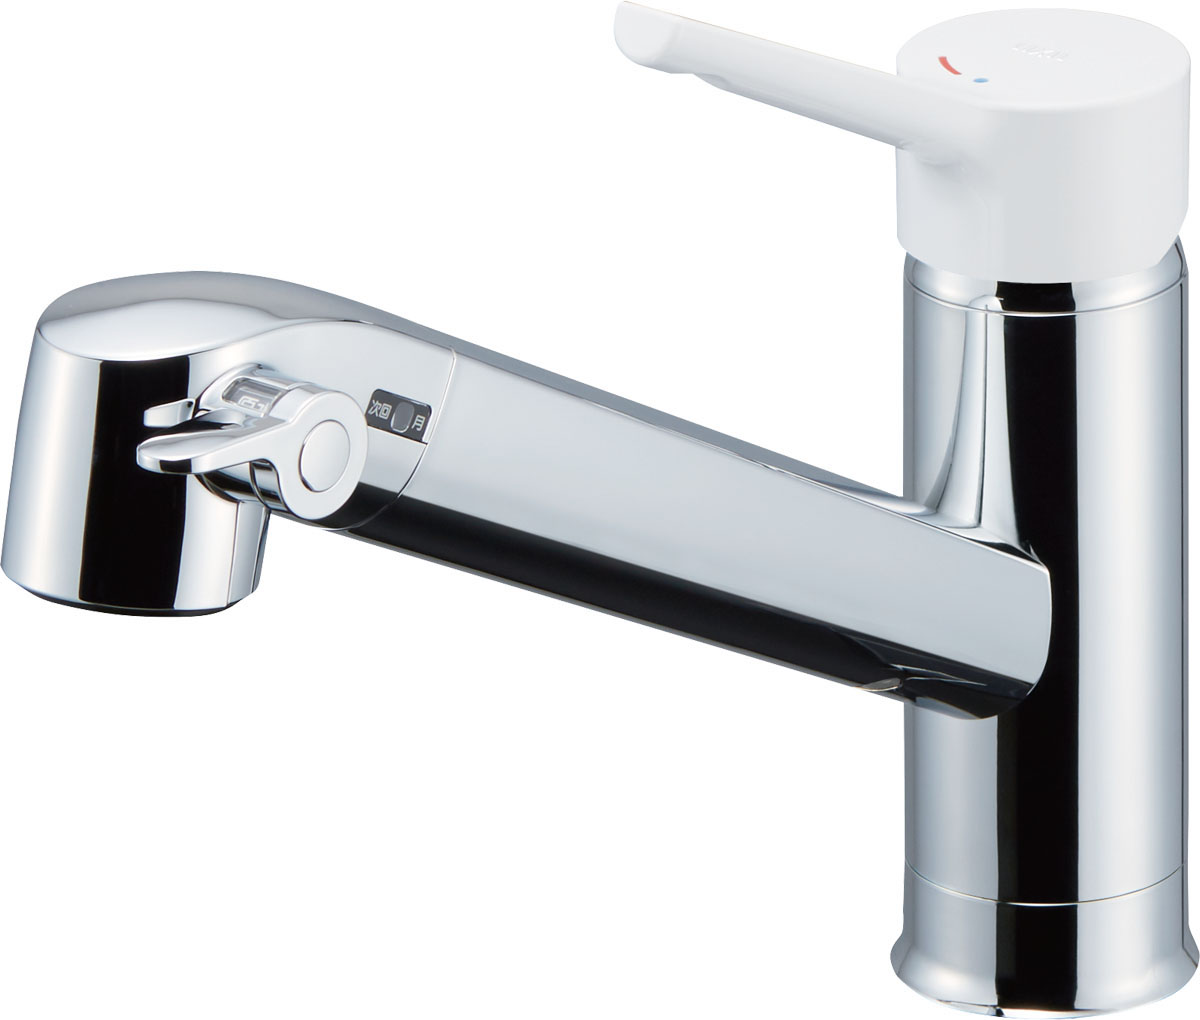 INAX LIXIL キッチン水栓 JF-AG442SYX (JW) オールインワン浄水栓 FNタイプ イナックス リクシル